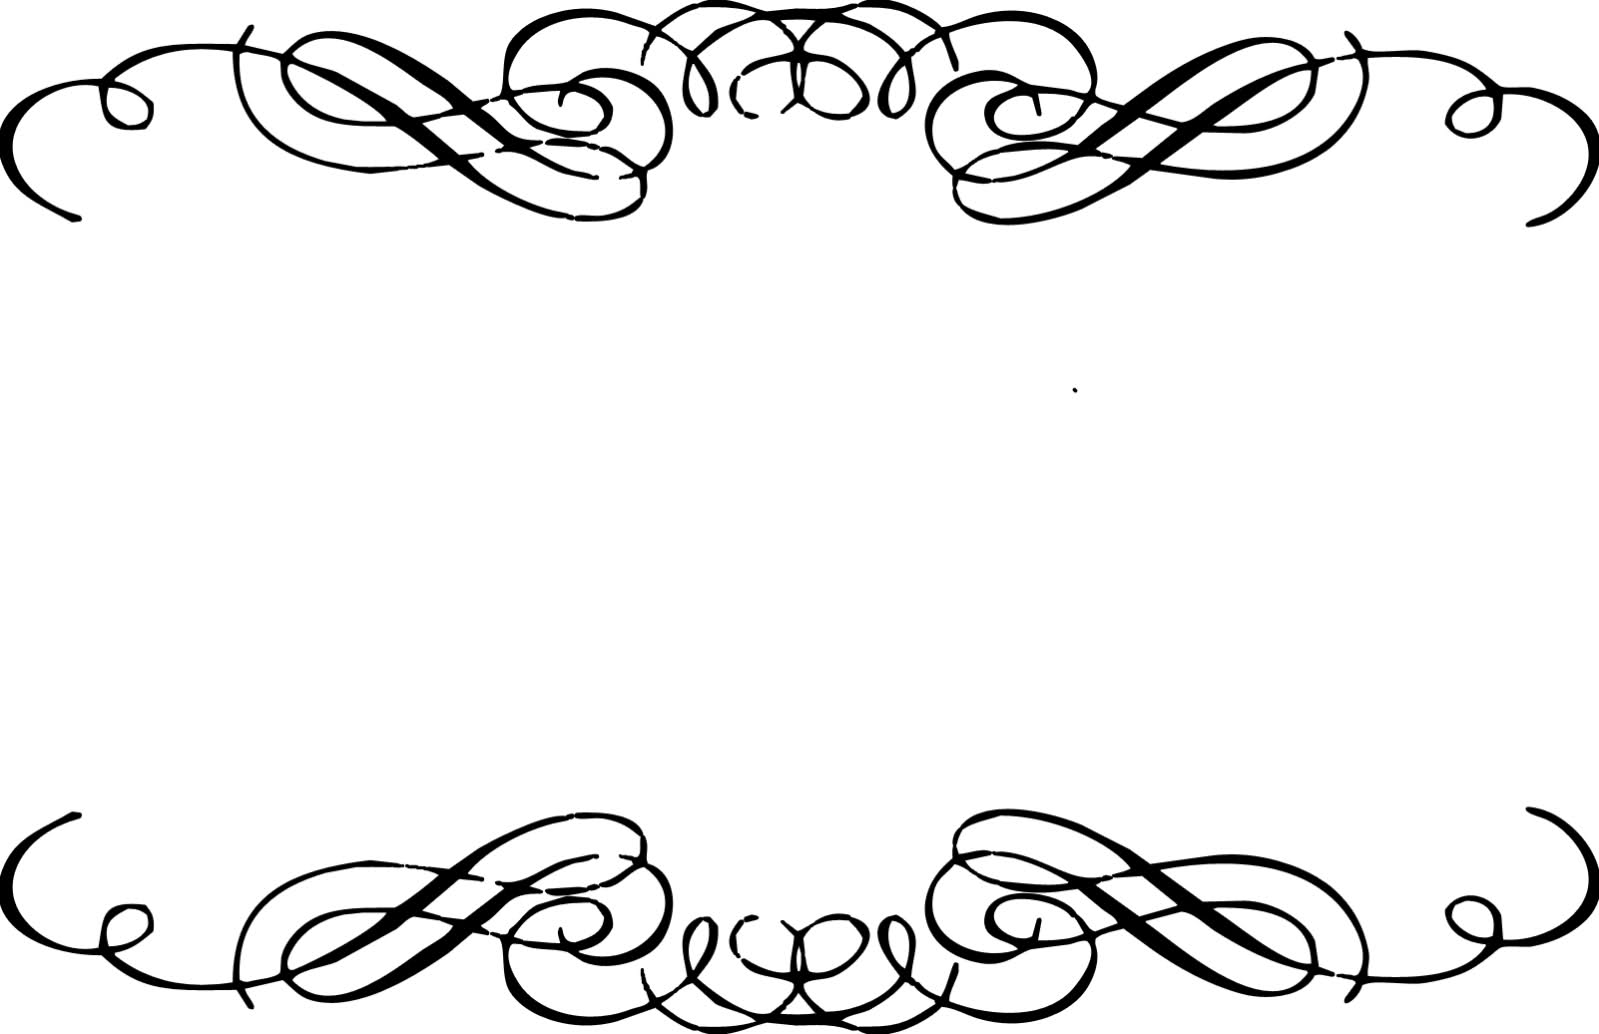 Swirl Border Clipart Swirl Border Clip A-Swirl Border Clipart Swirl Border Clip Art Free Jpg-0